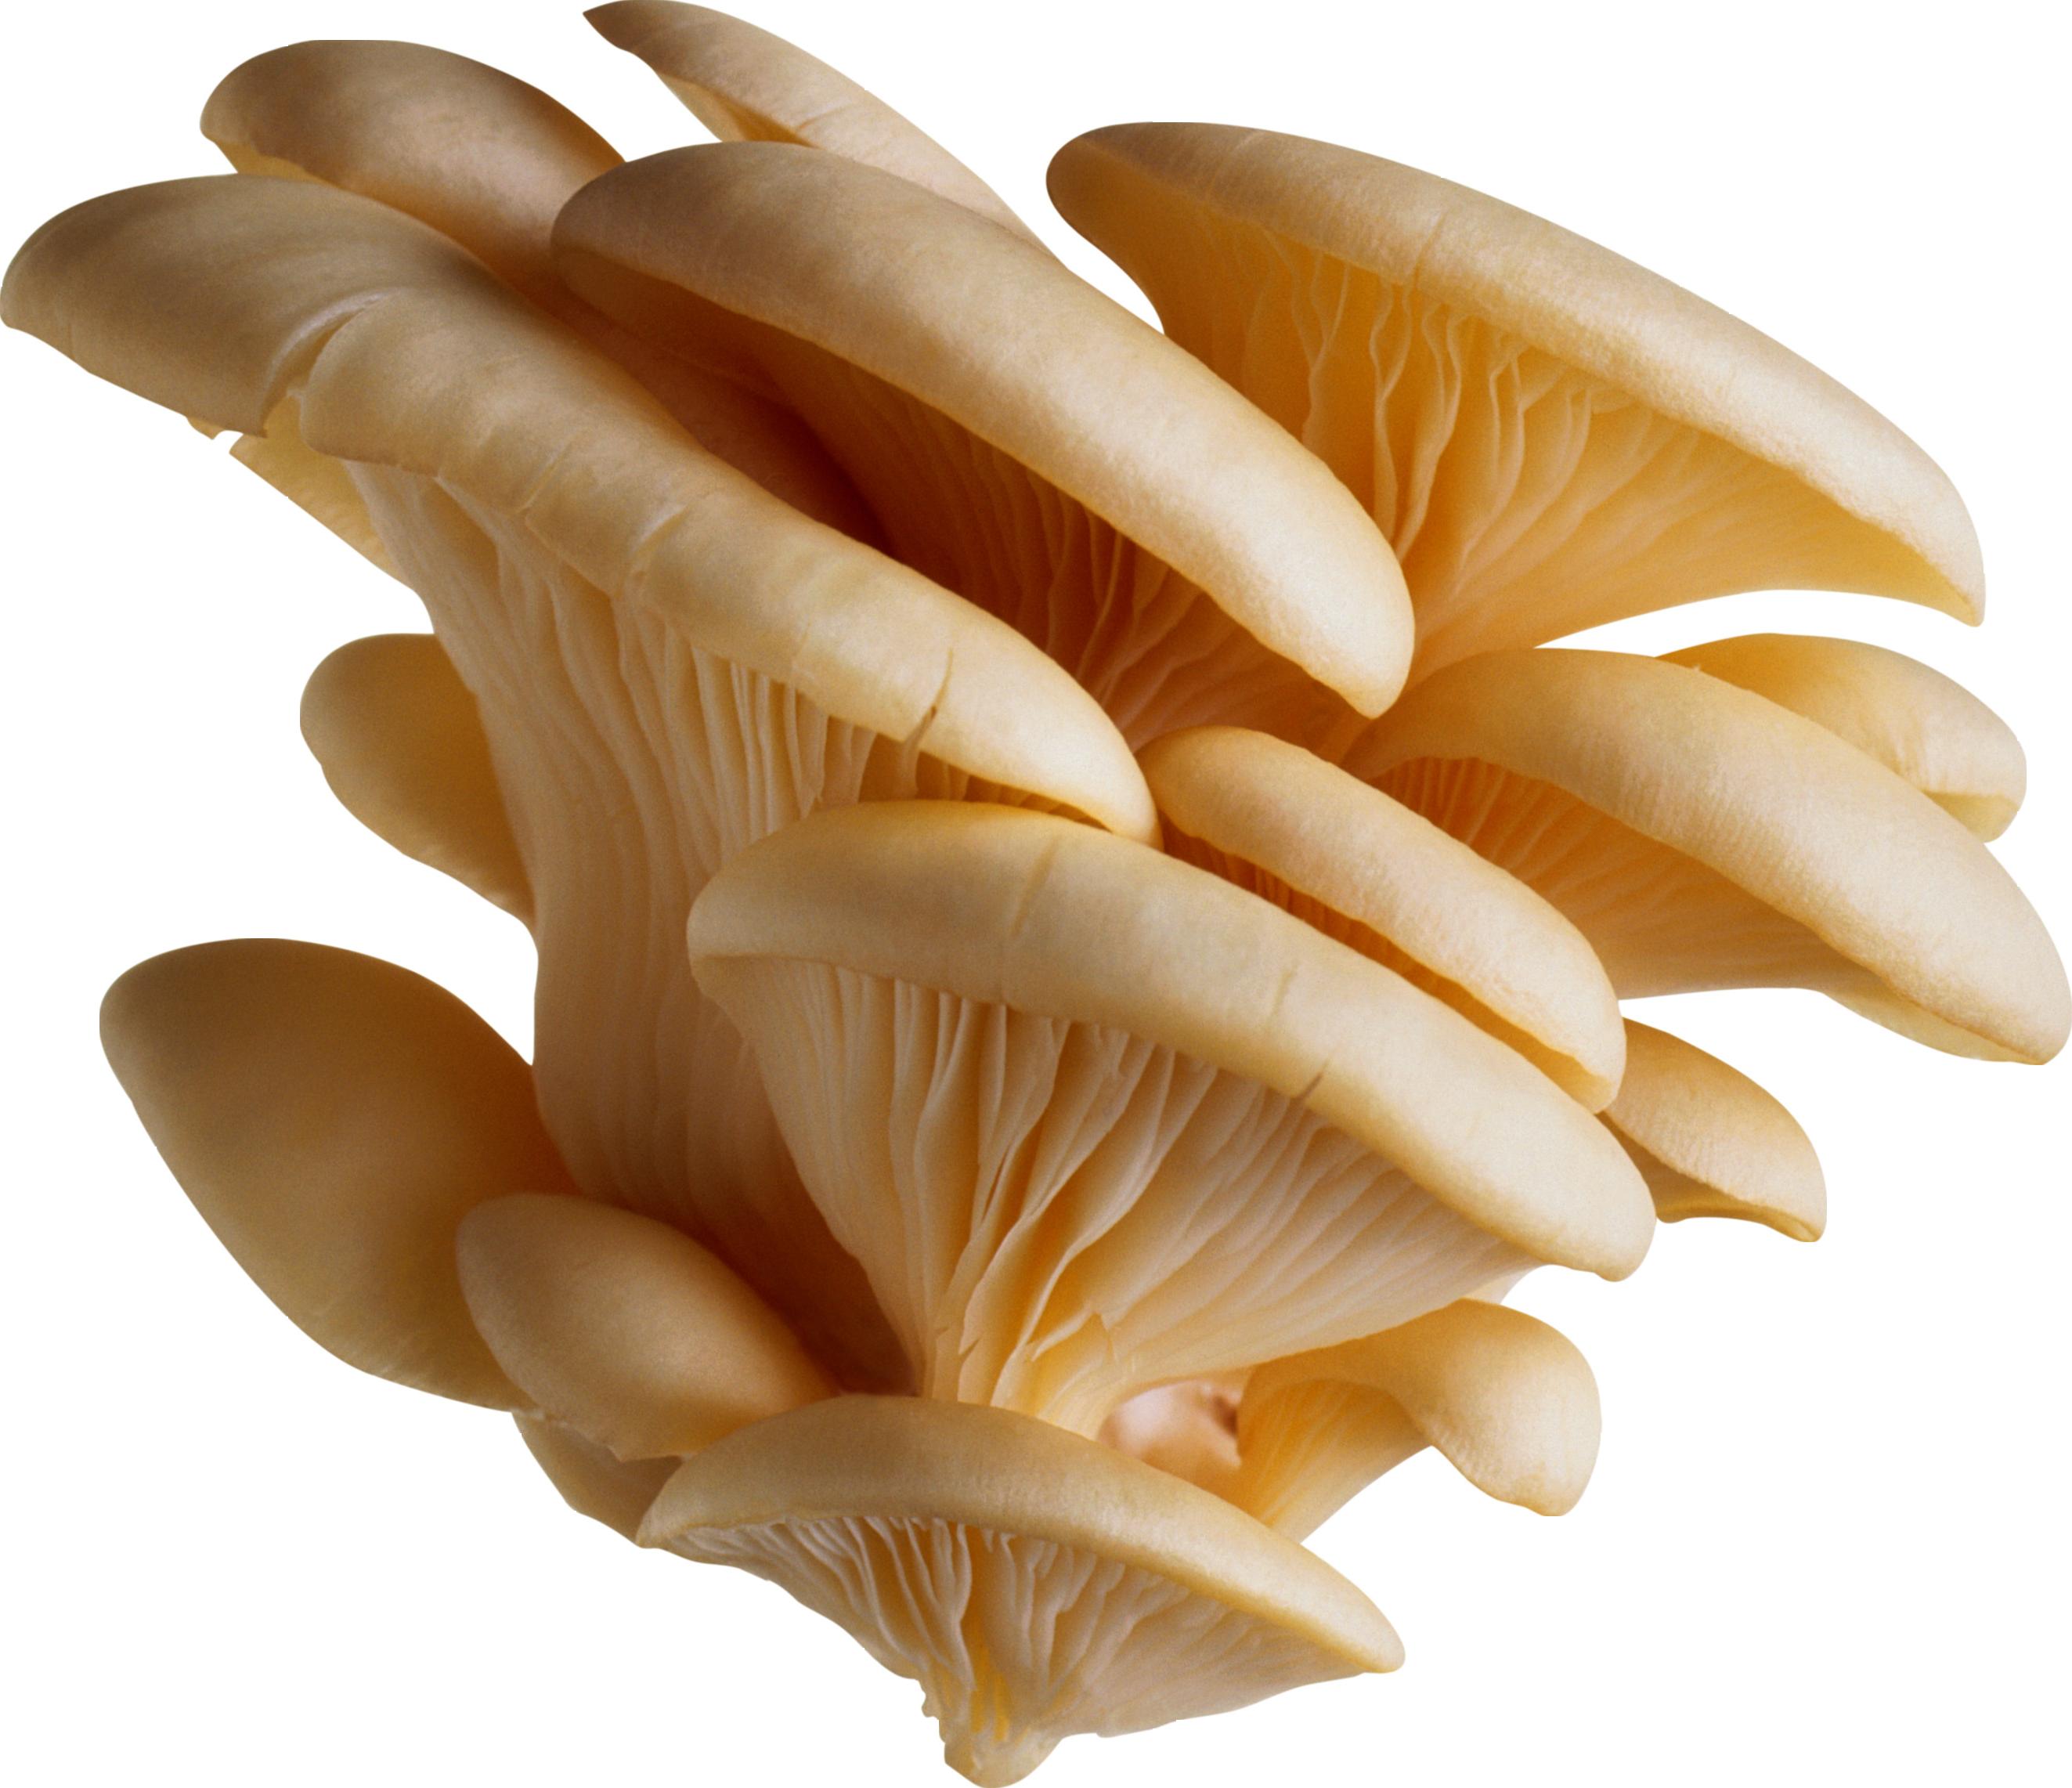 High Resolution Wallpaper | Mushroom 2646x2283 px